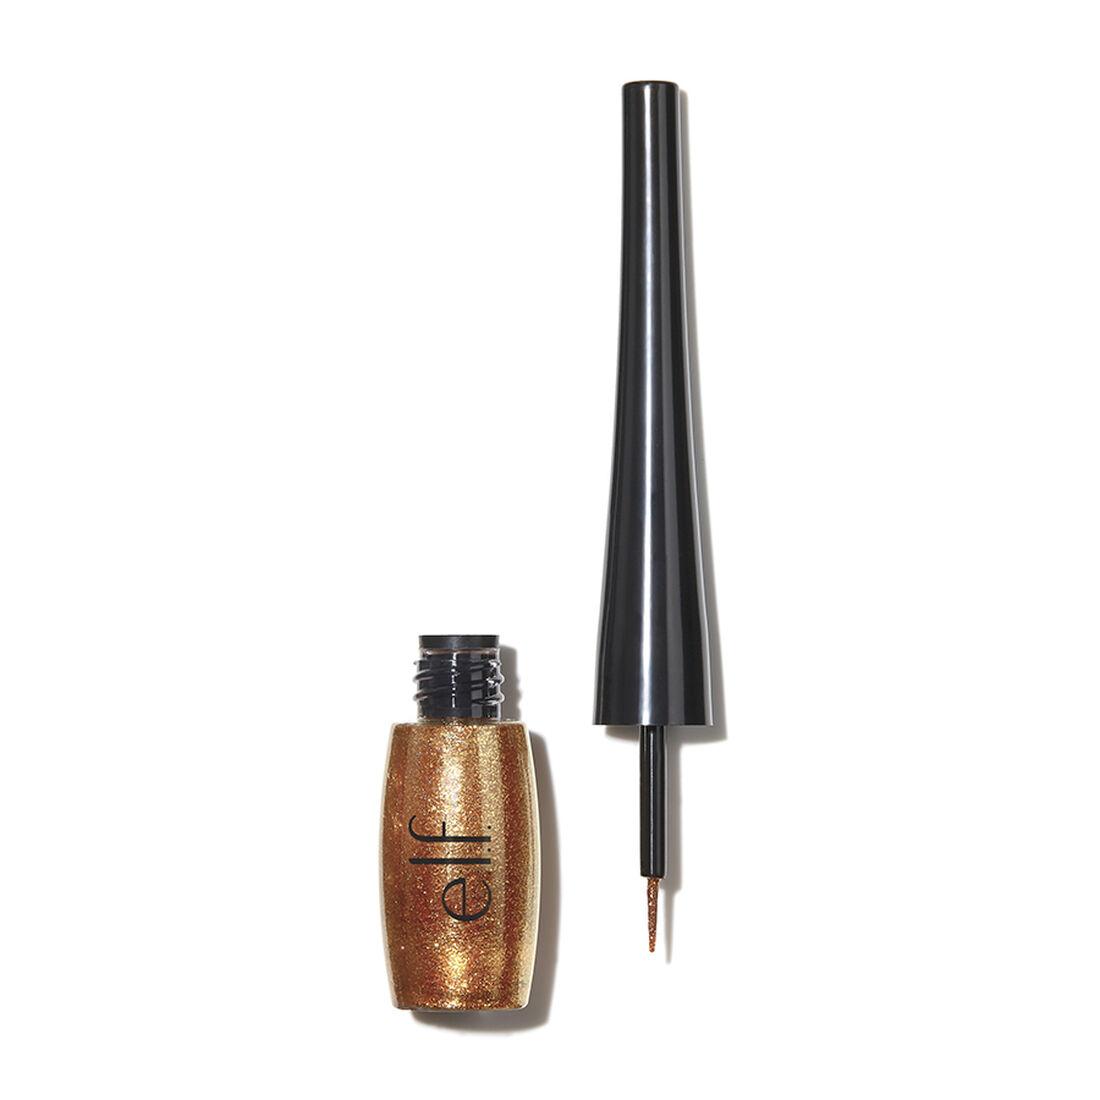 e.l.f. Cosmetics - Stardust Glitter Eyeliner